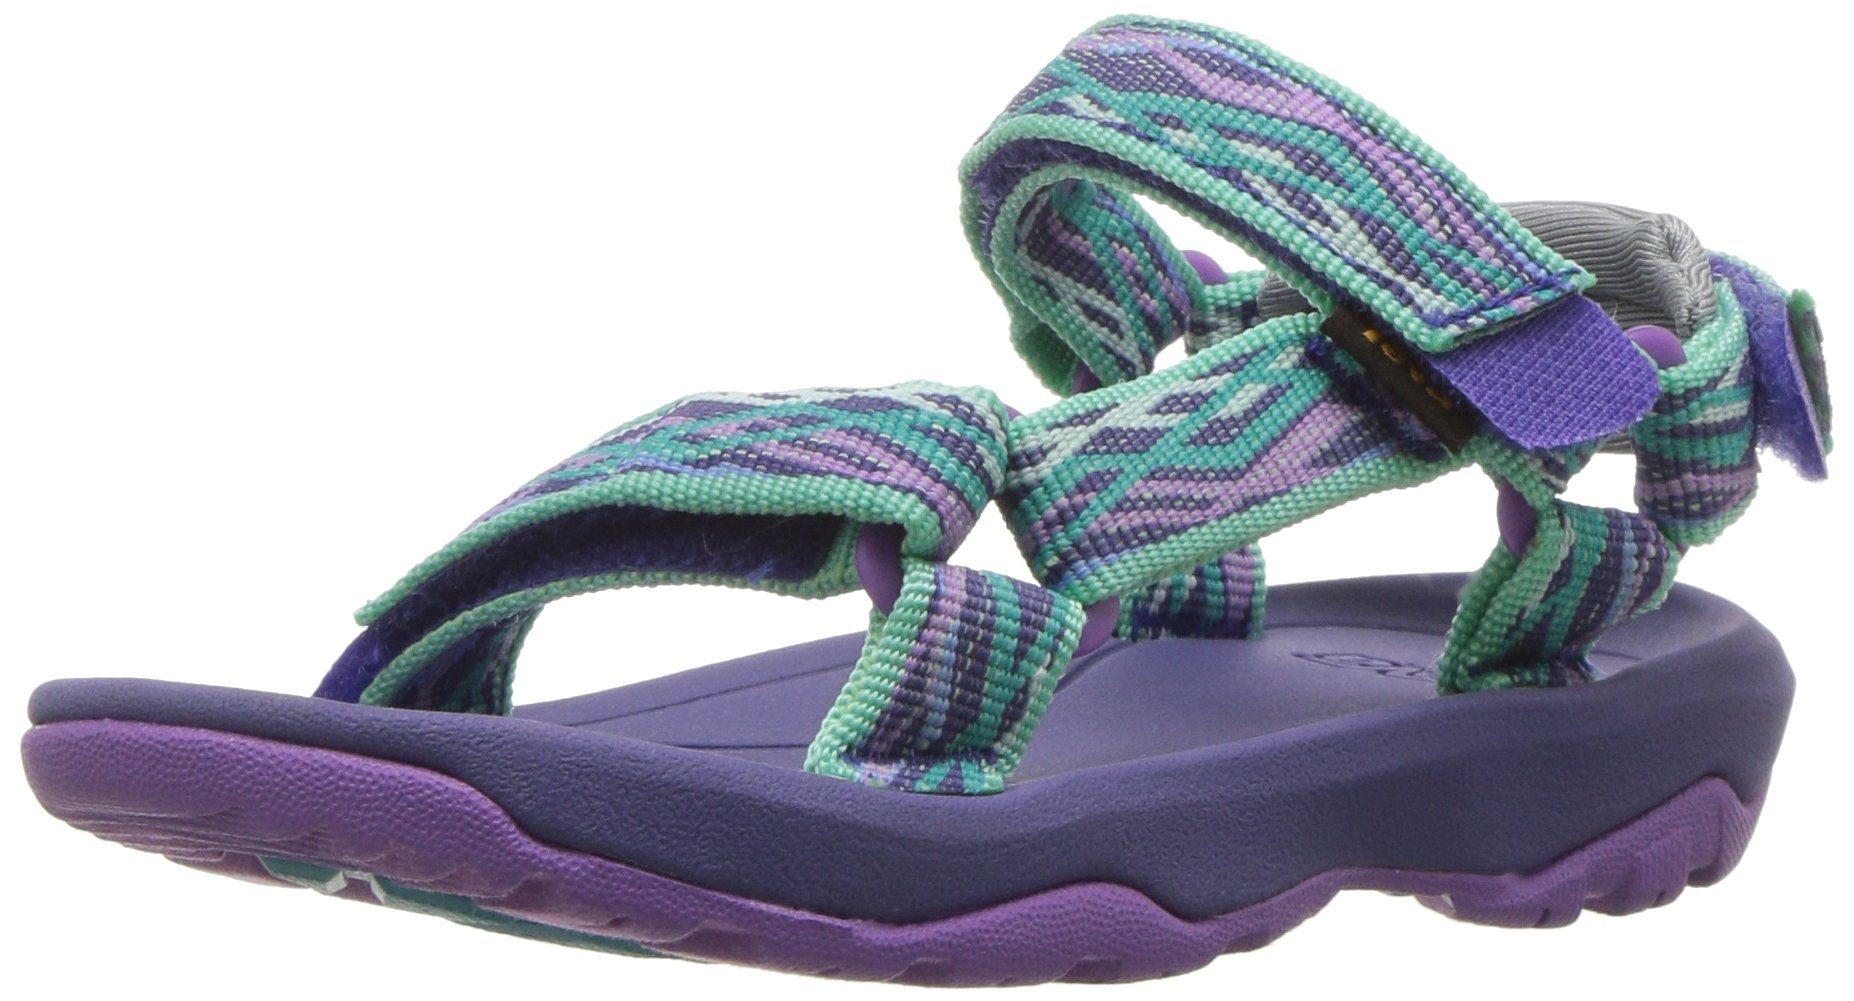 Teva Girls' T Hurricane XLT 2 Sport Sandal, Delmar Sea Glass/Purple, 10 M US Toddler